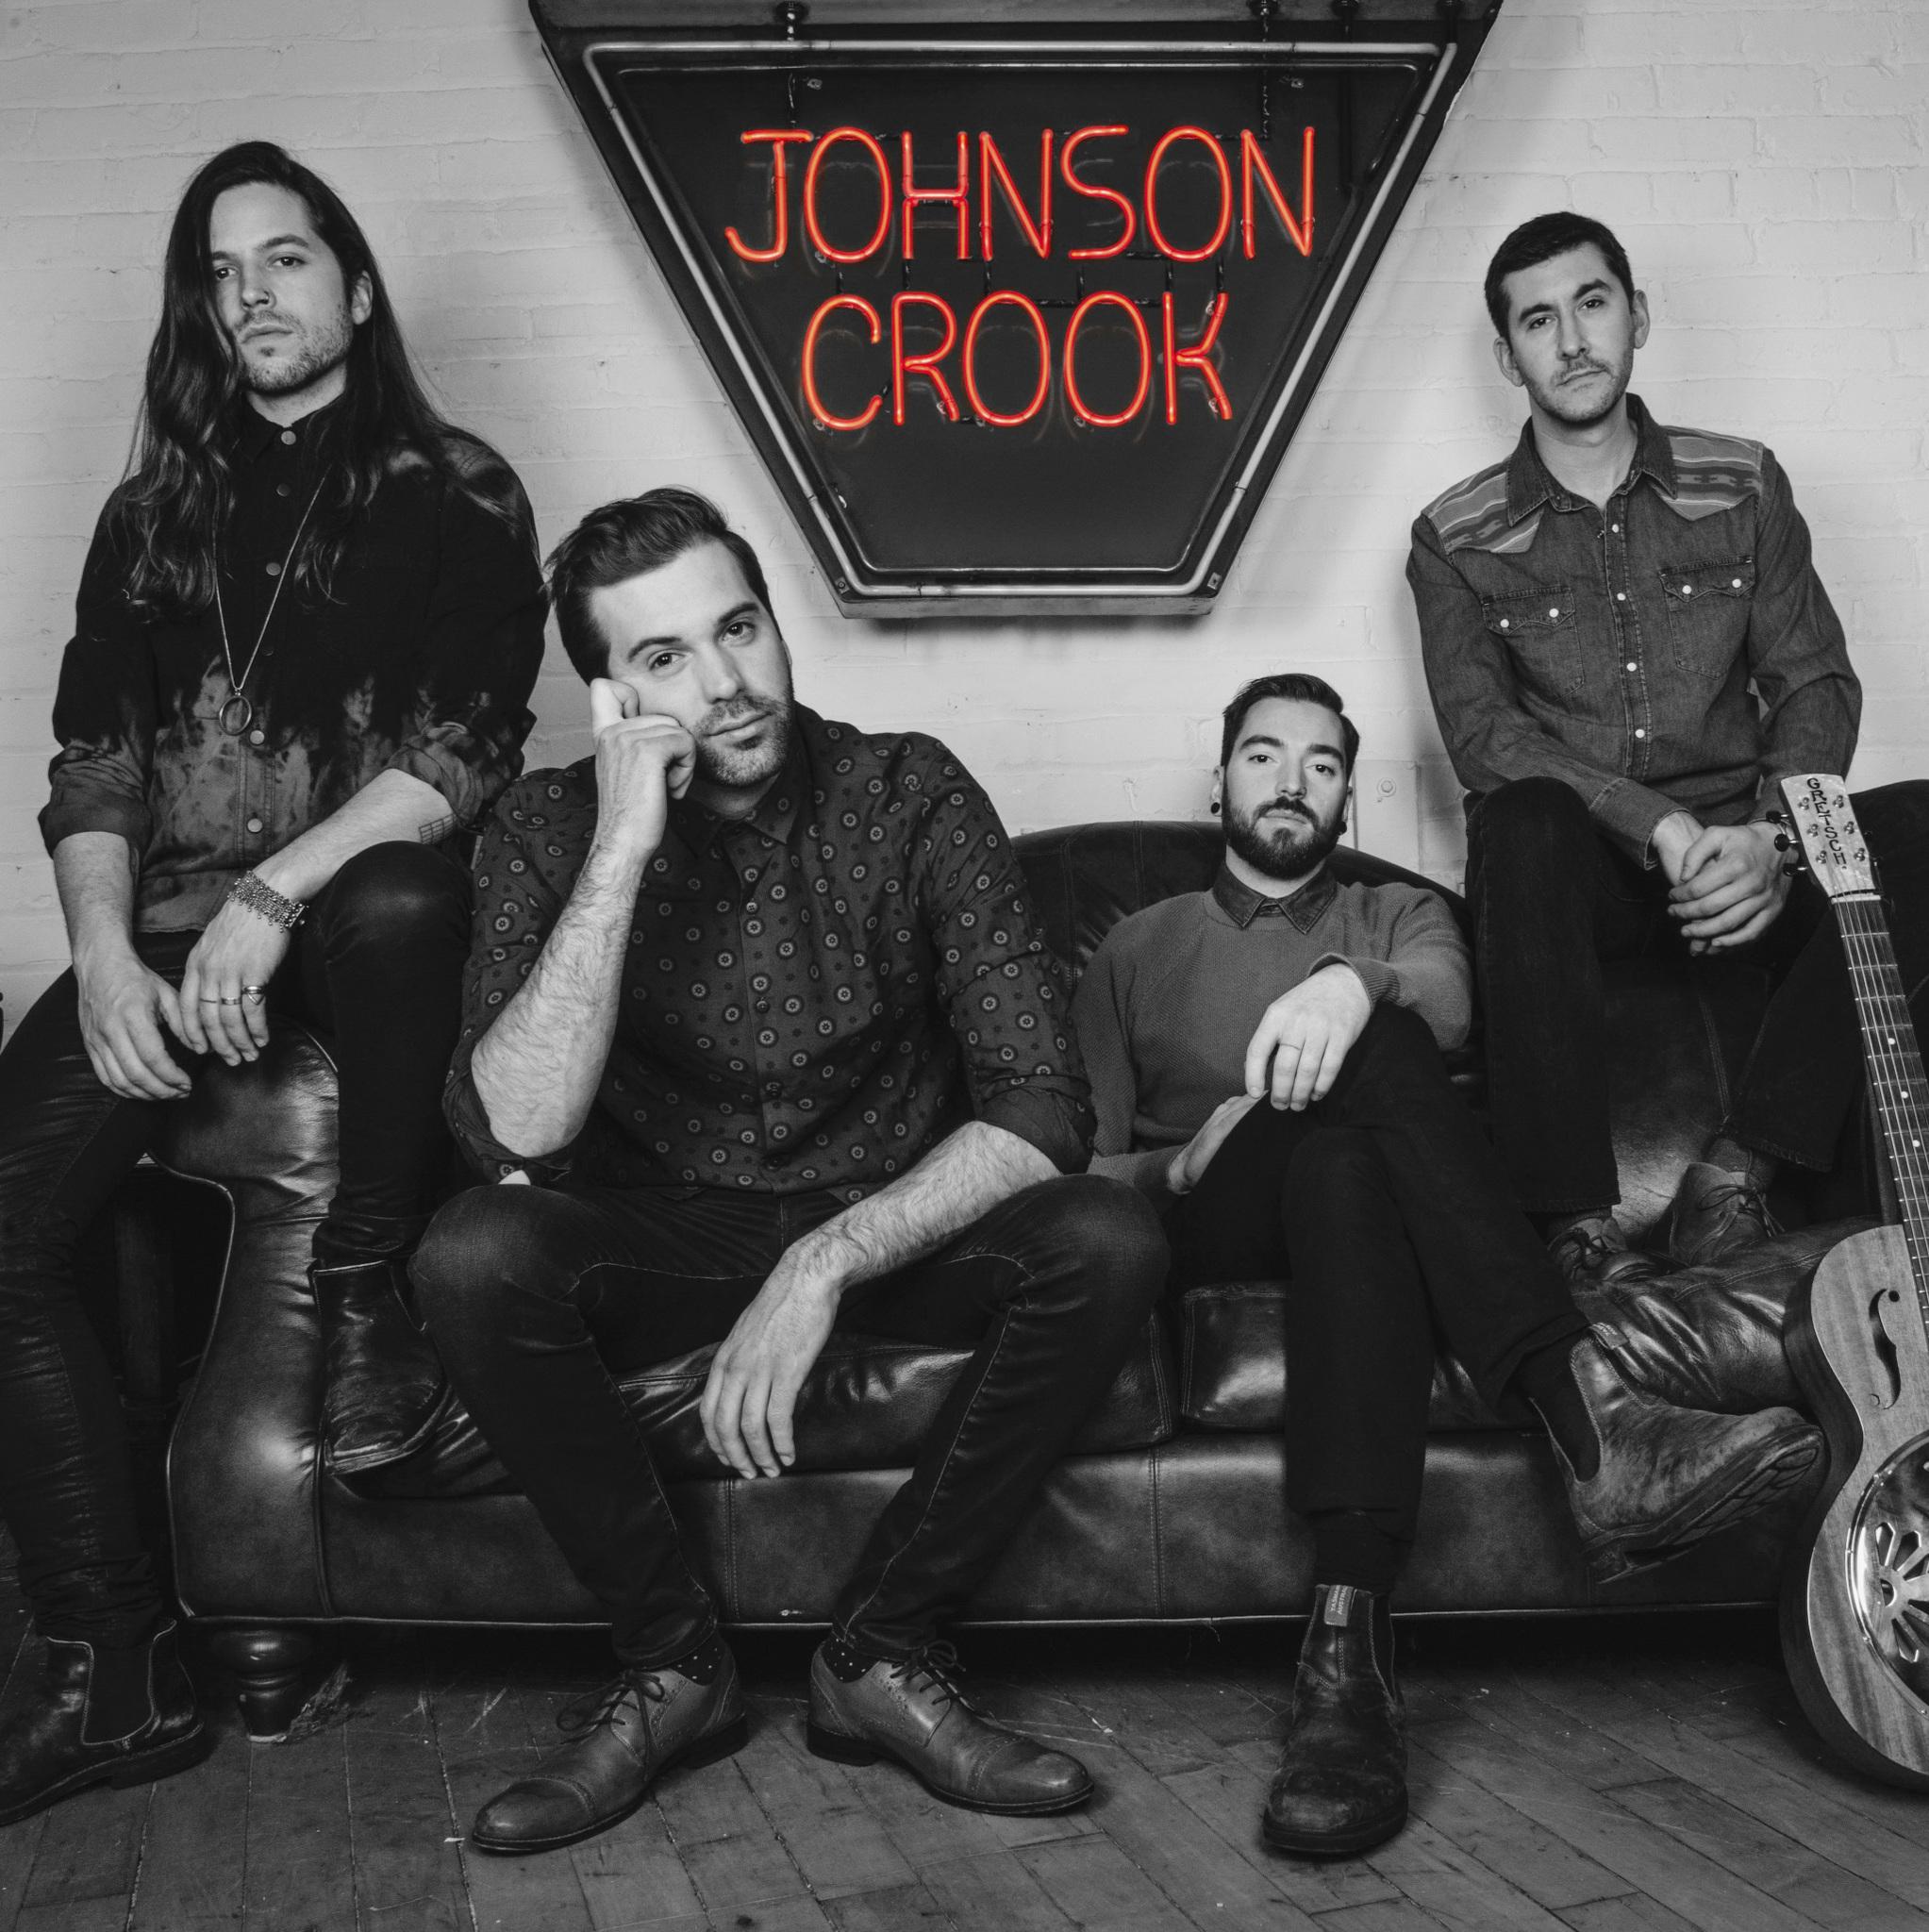 Johnson Crook